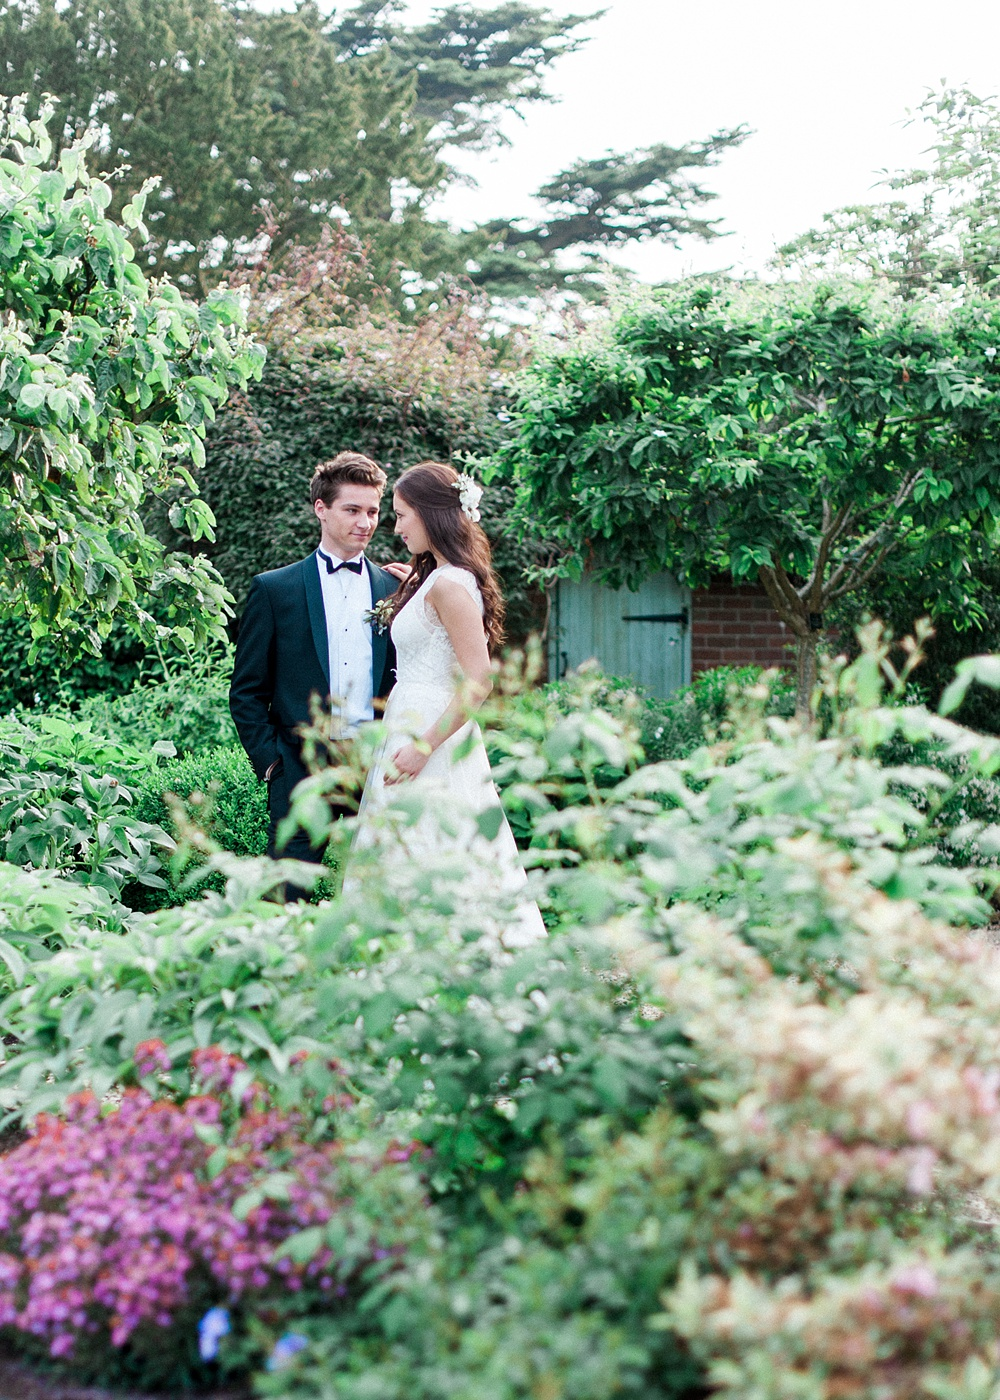 country wedding-charlotte munro wedding styling-wickham house-kate nielen_0091.jpg